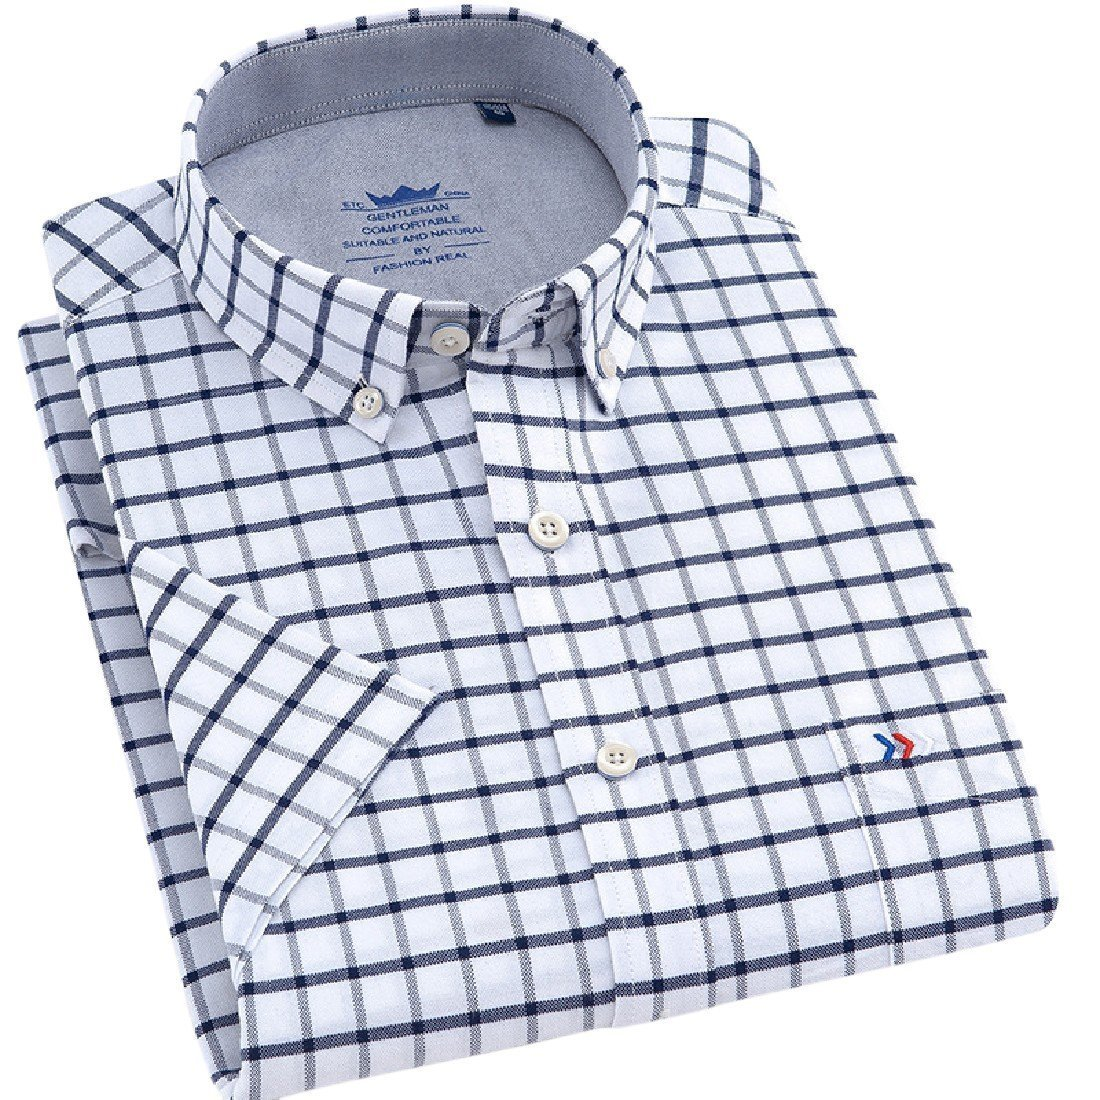 YUNY Men Cotton Oversize Summer Short-Sleeve Leisure Button Down Shirt 18 L